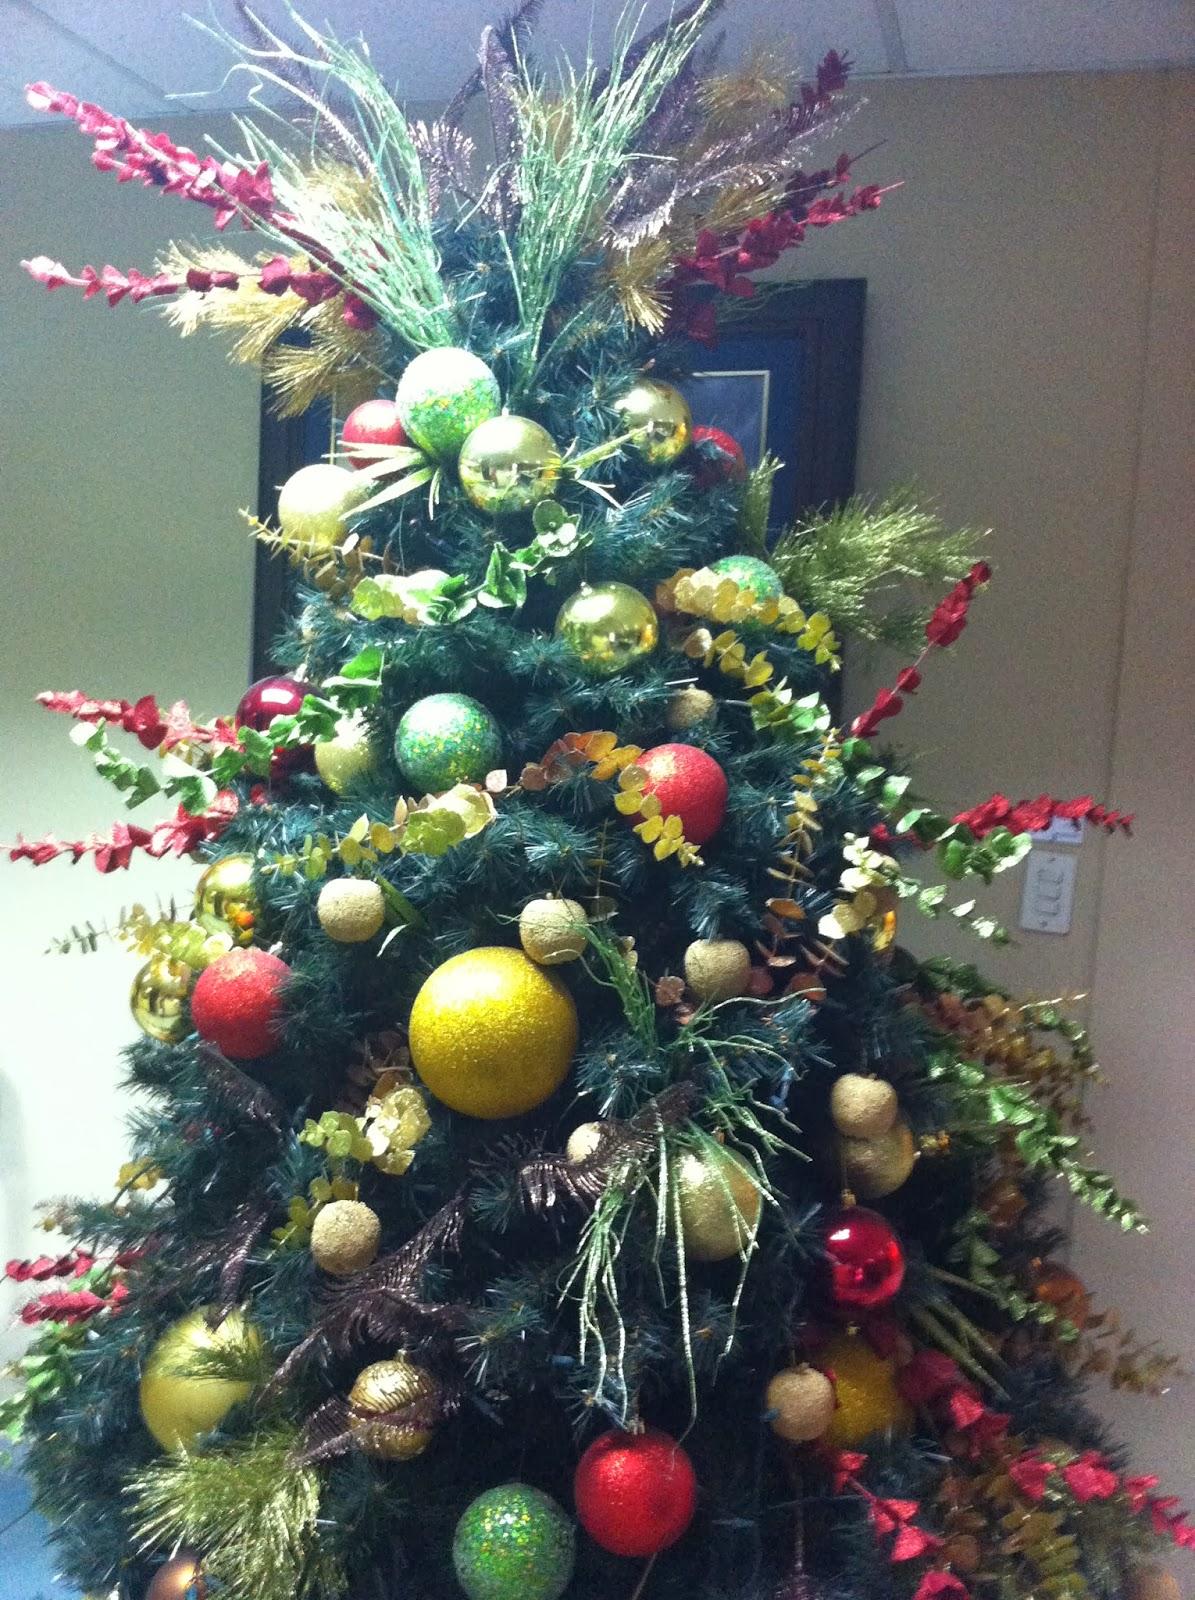 Ideashot arboles navide os - Decoracion arboles navidenos ...